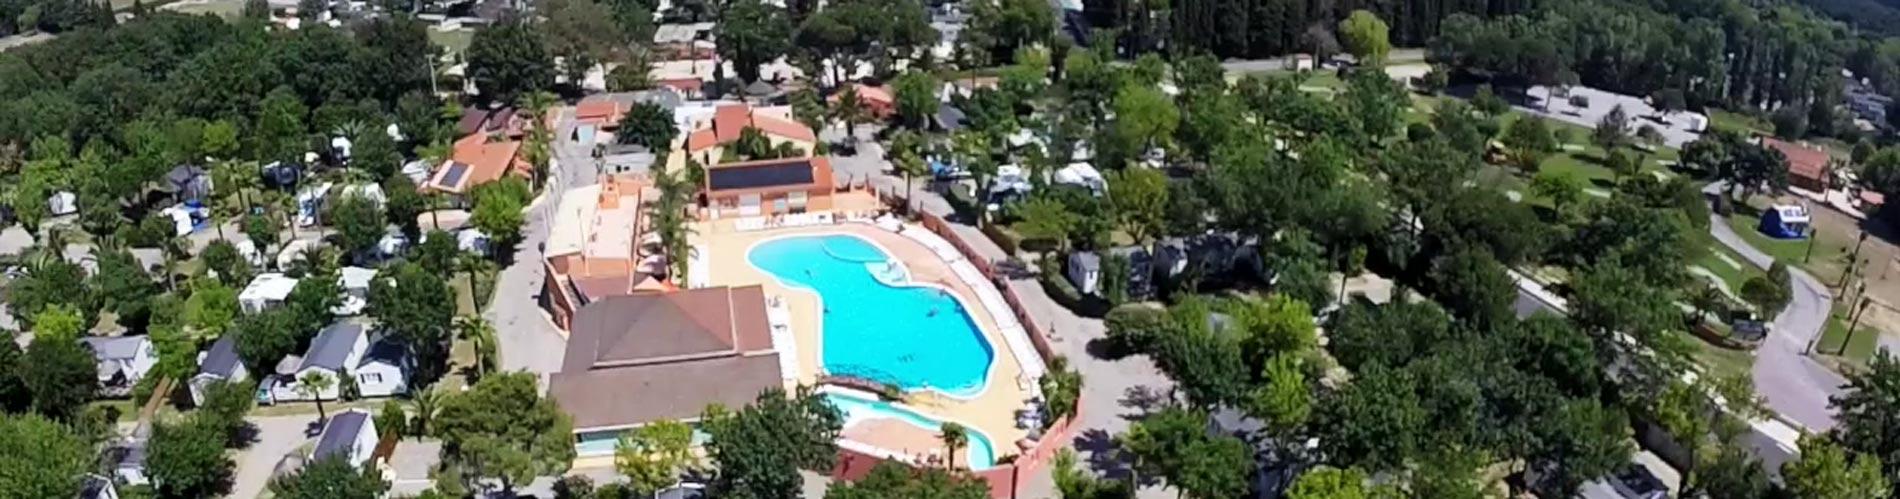 Camping argeles sur mer avec parc aquatique for Camping erquy avec piscine